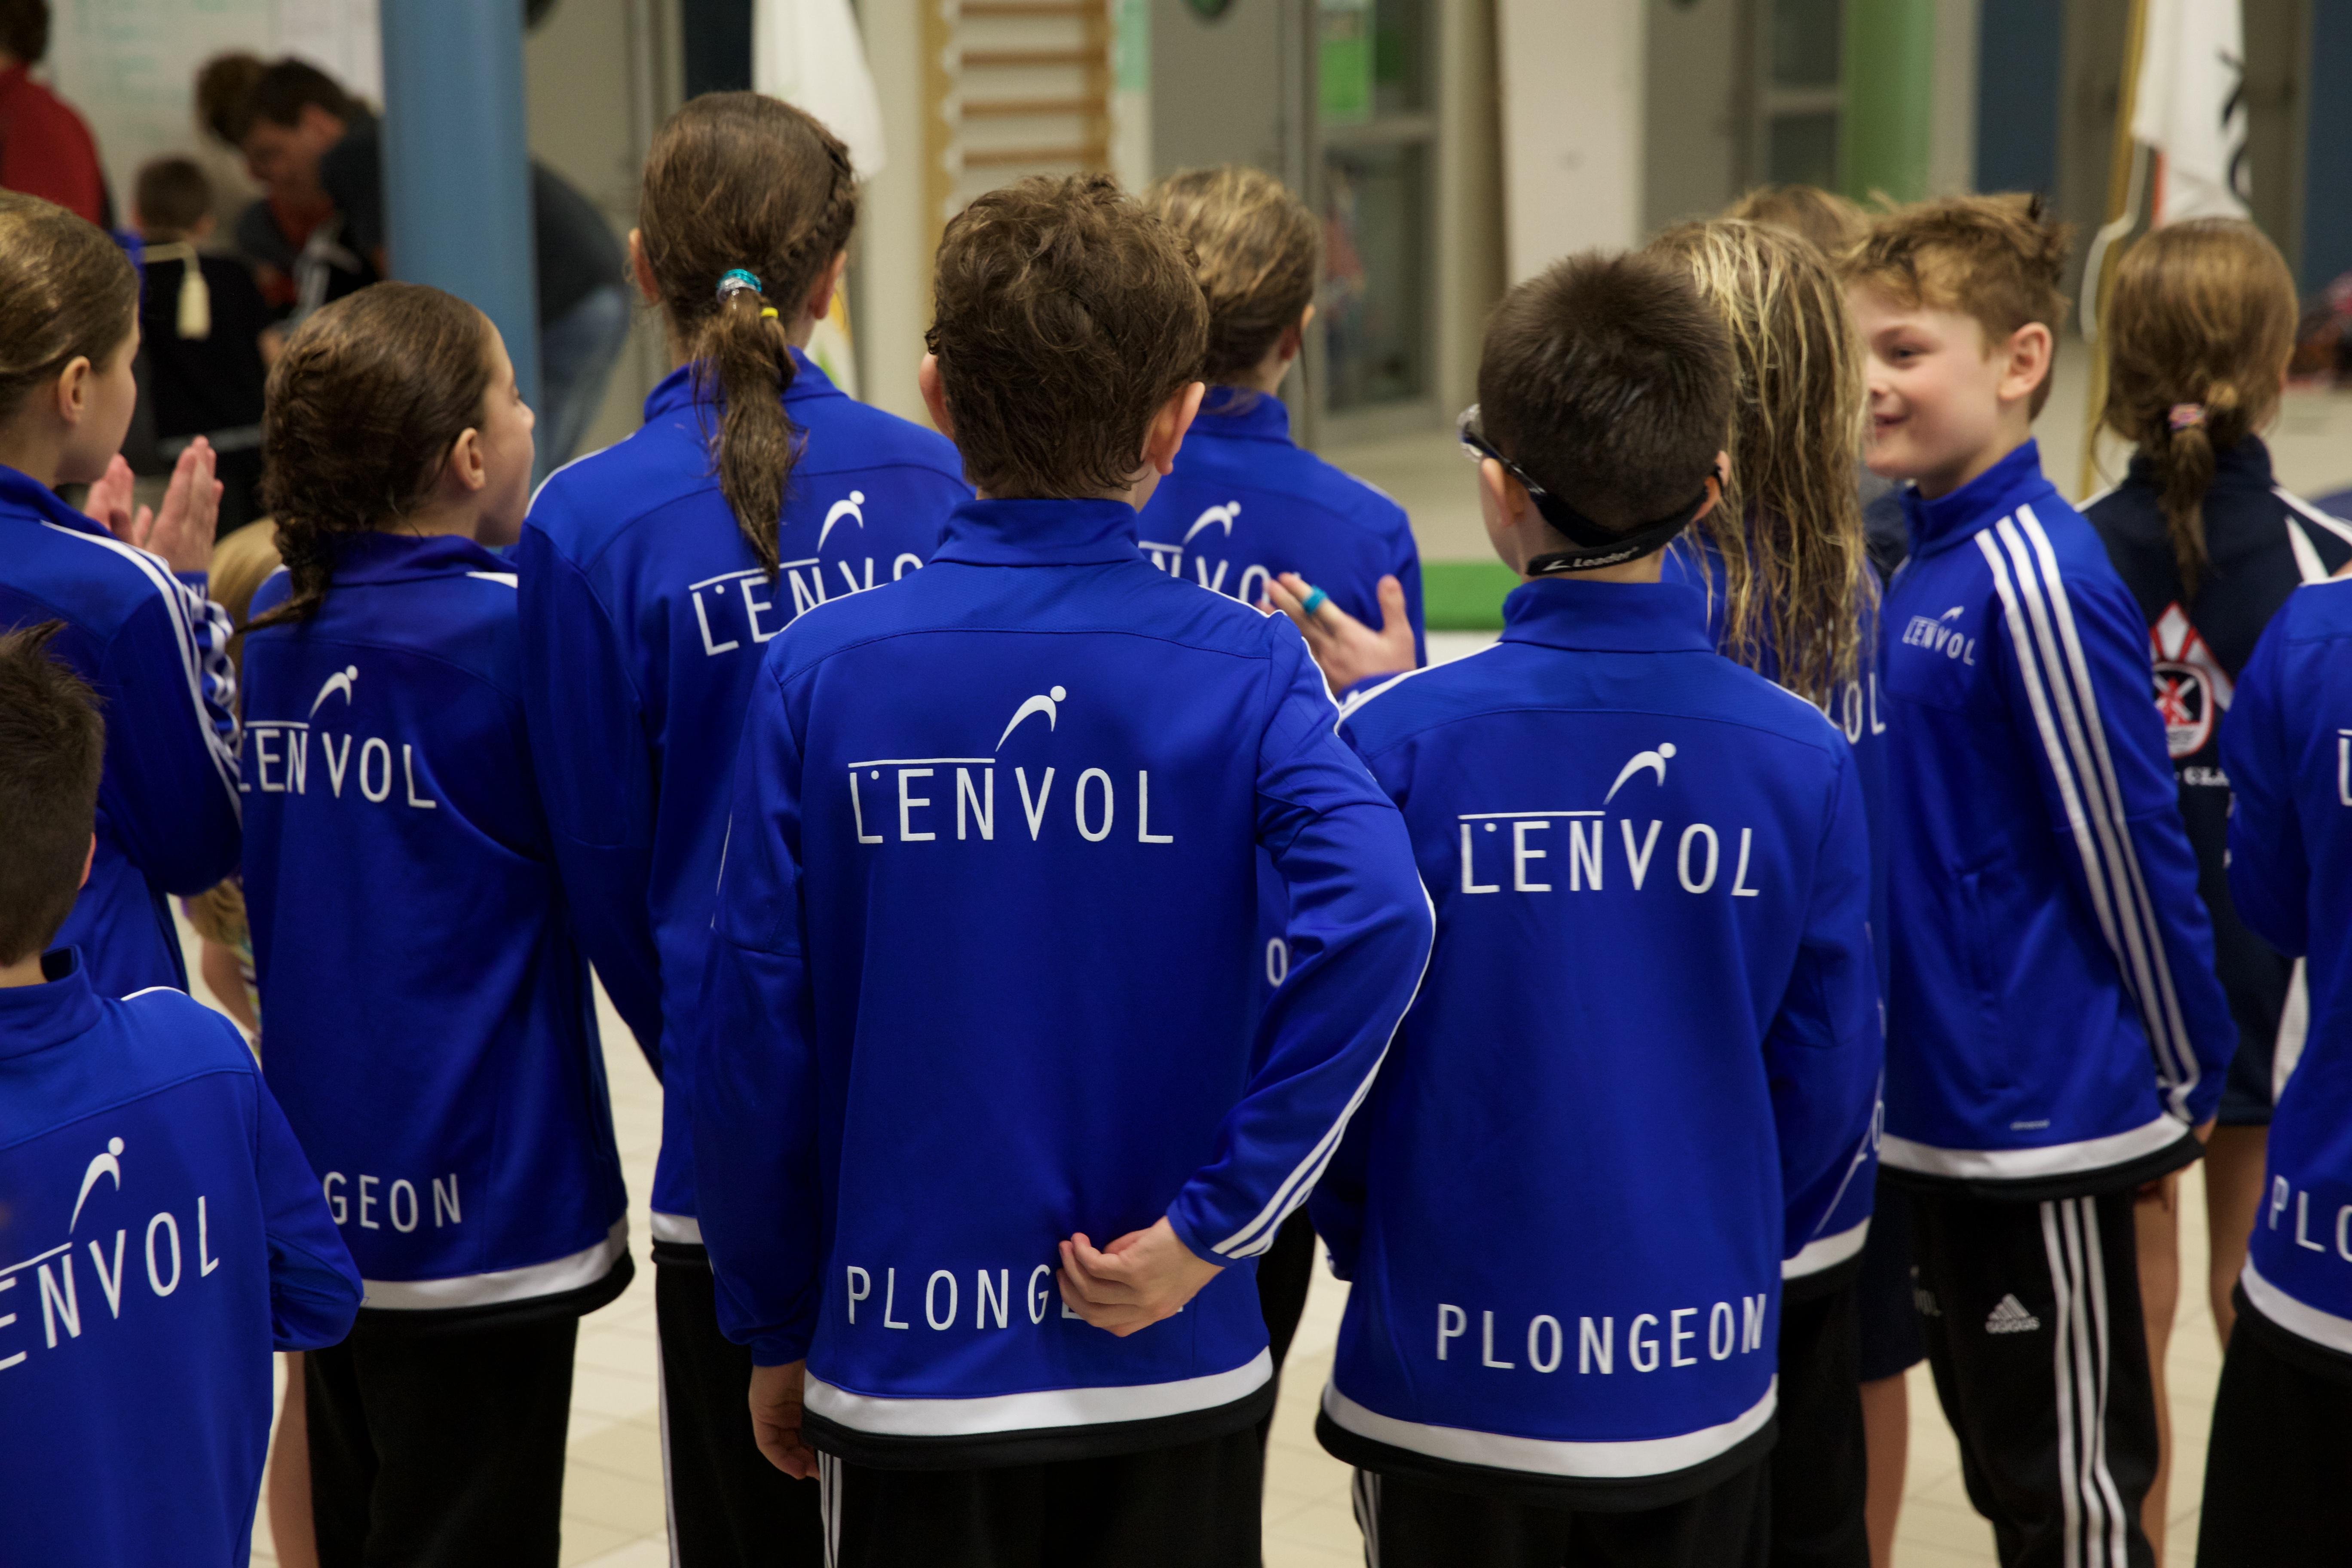 Club Plongeon Envol Blainville